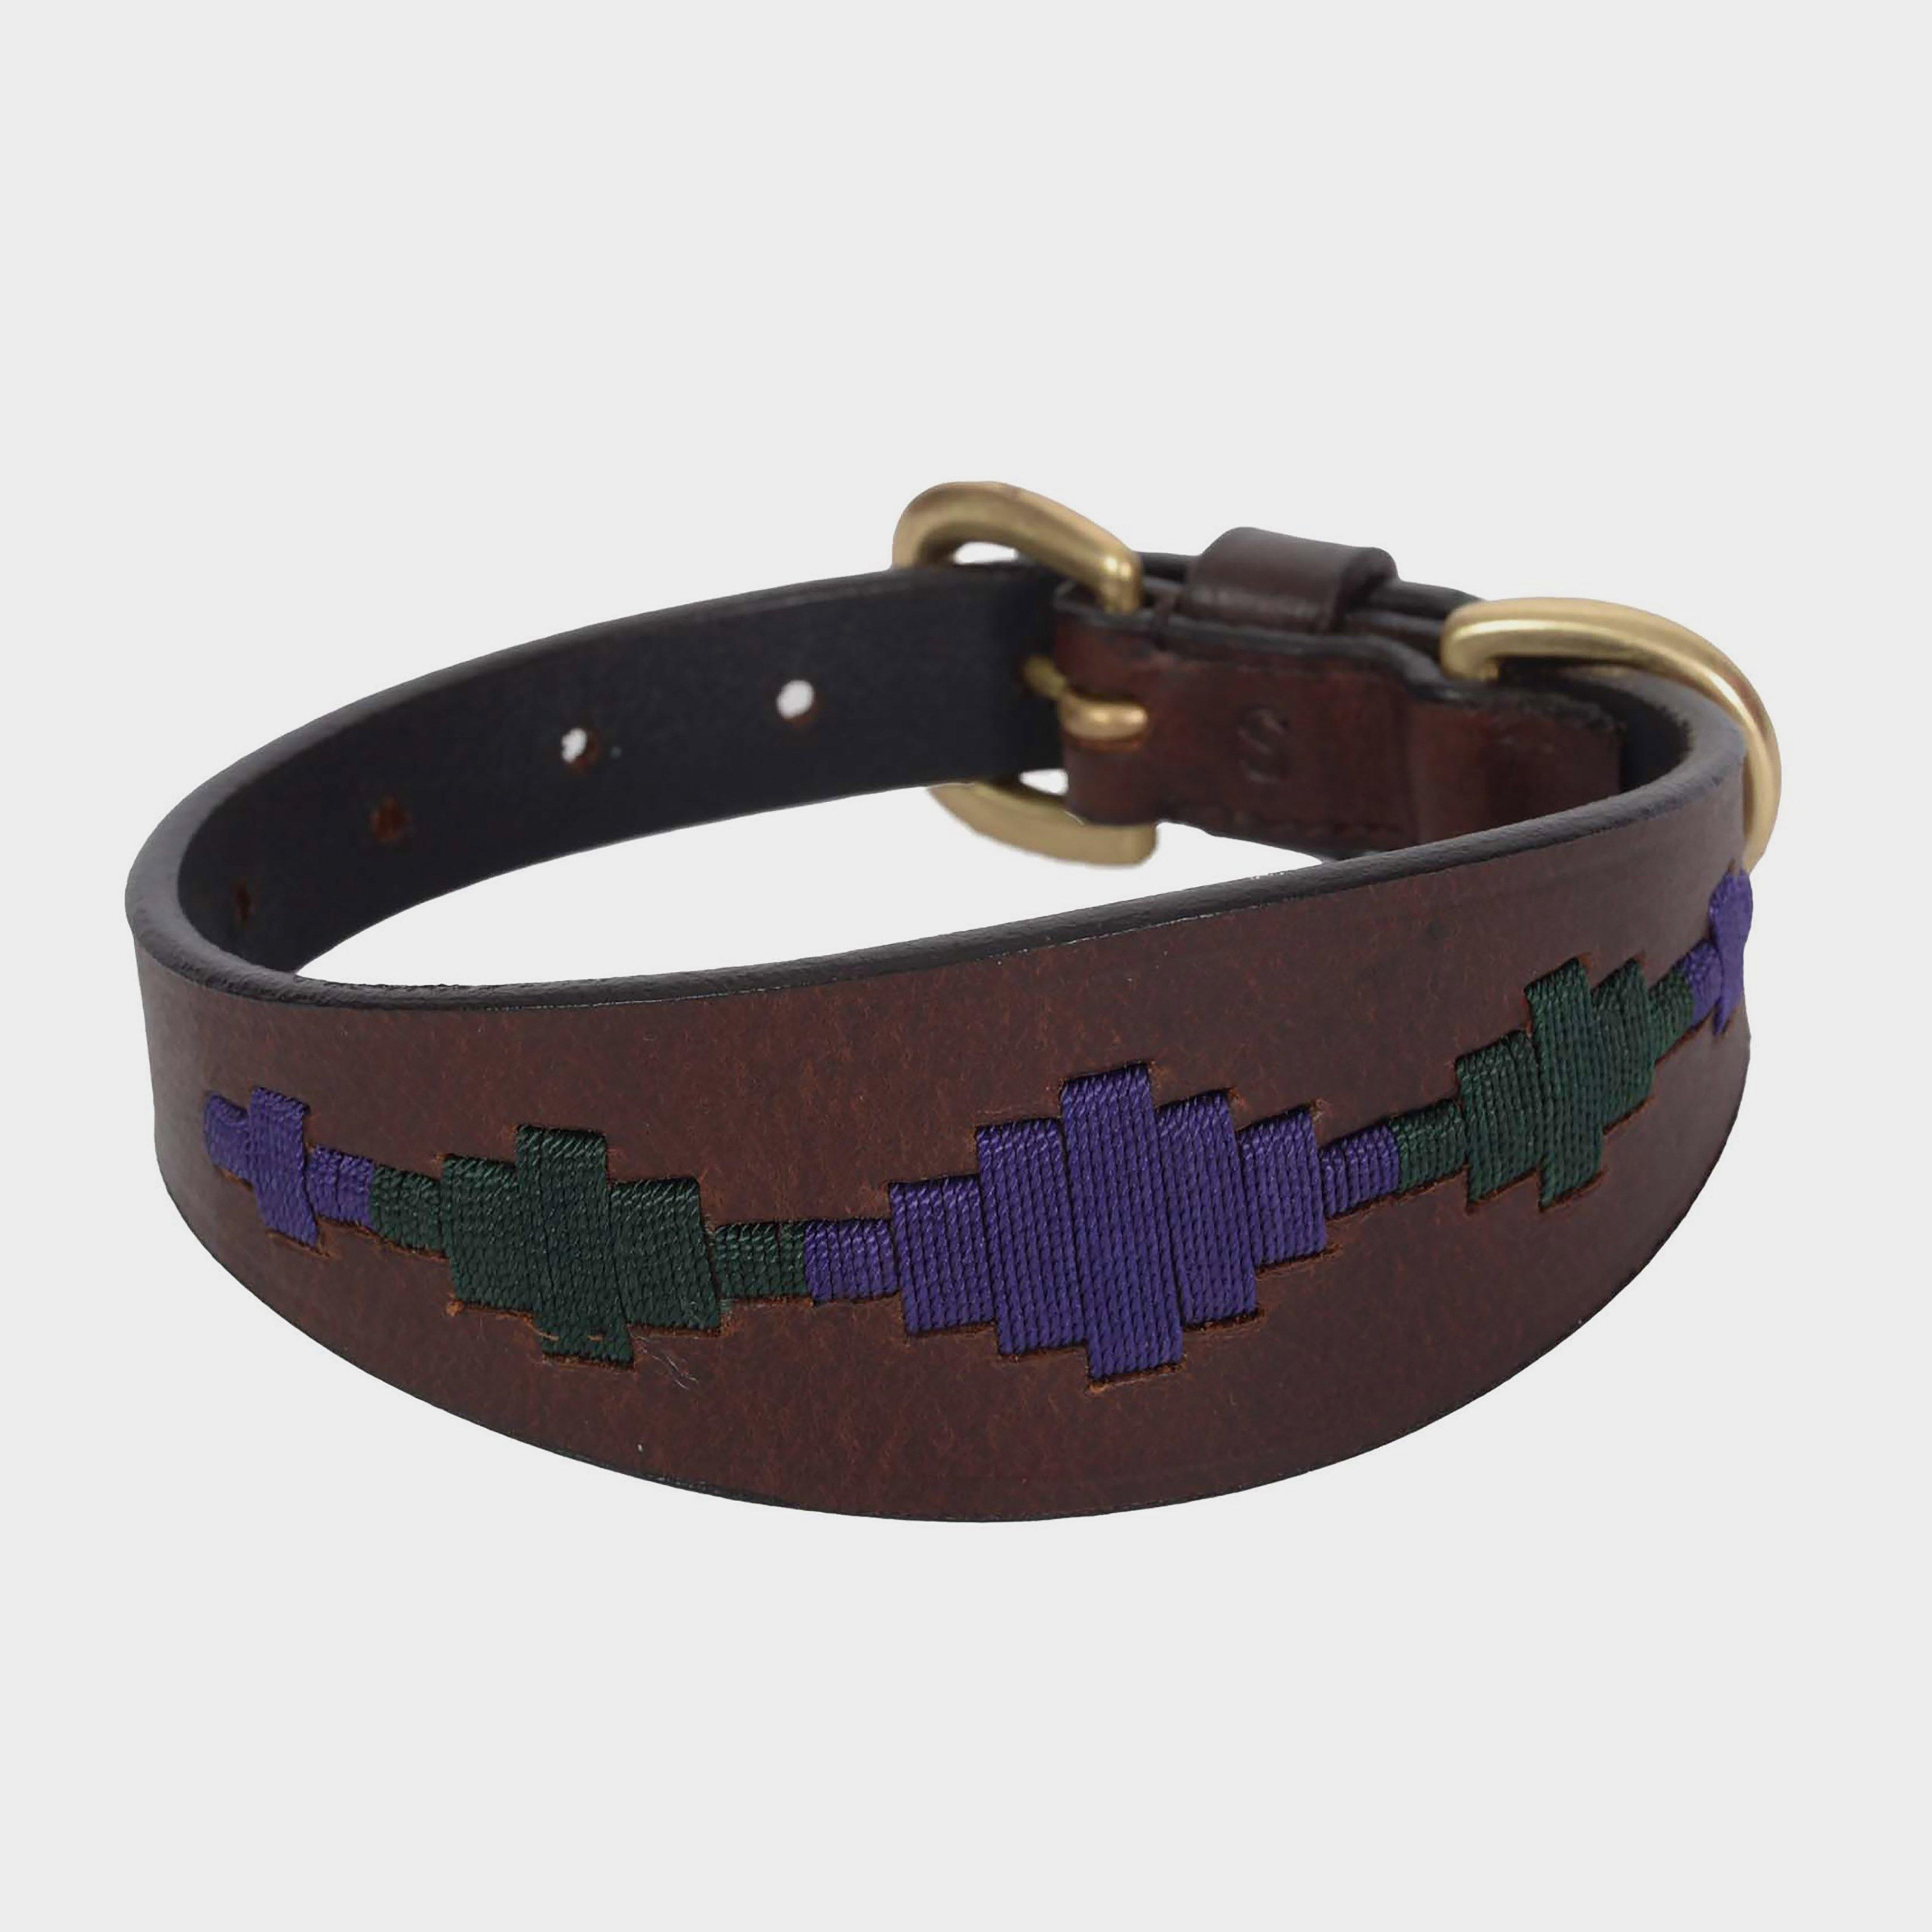 Image of Weatherbeeta Lurcher Polo Leather Dog Collar - Brown/Brown, Brown/Brown